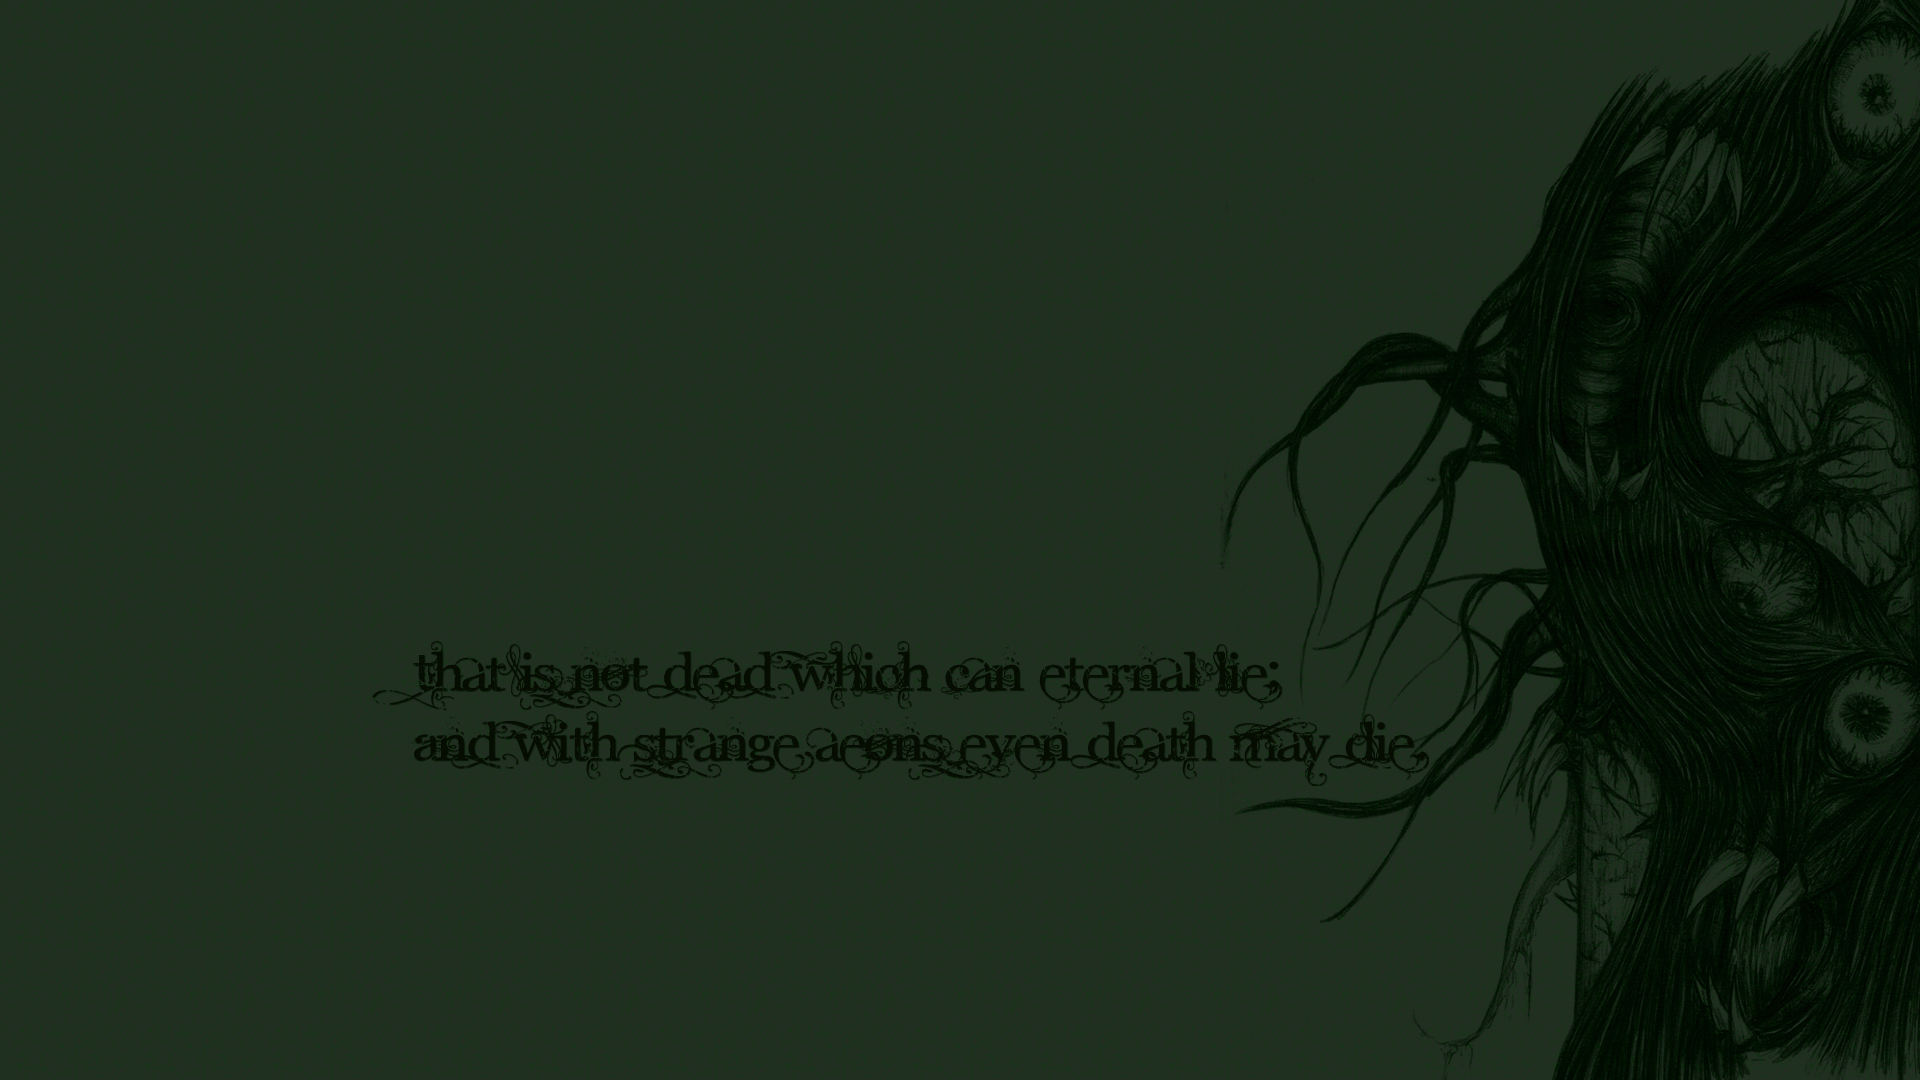 Cthulhu HP Lovecraft